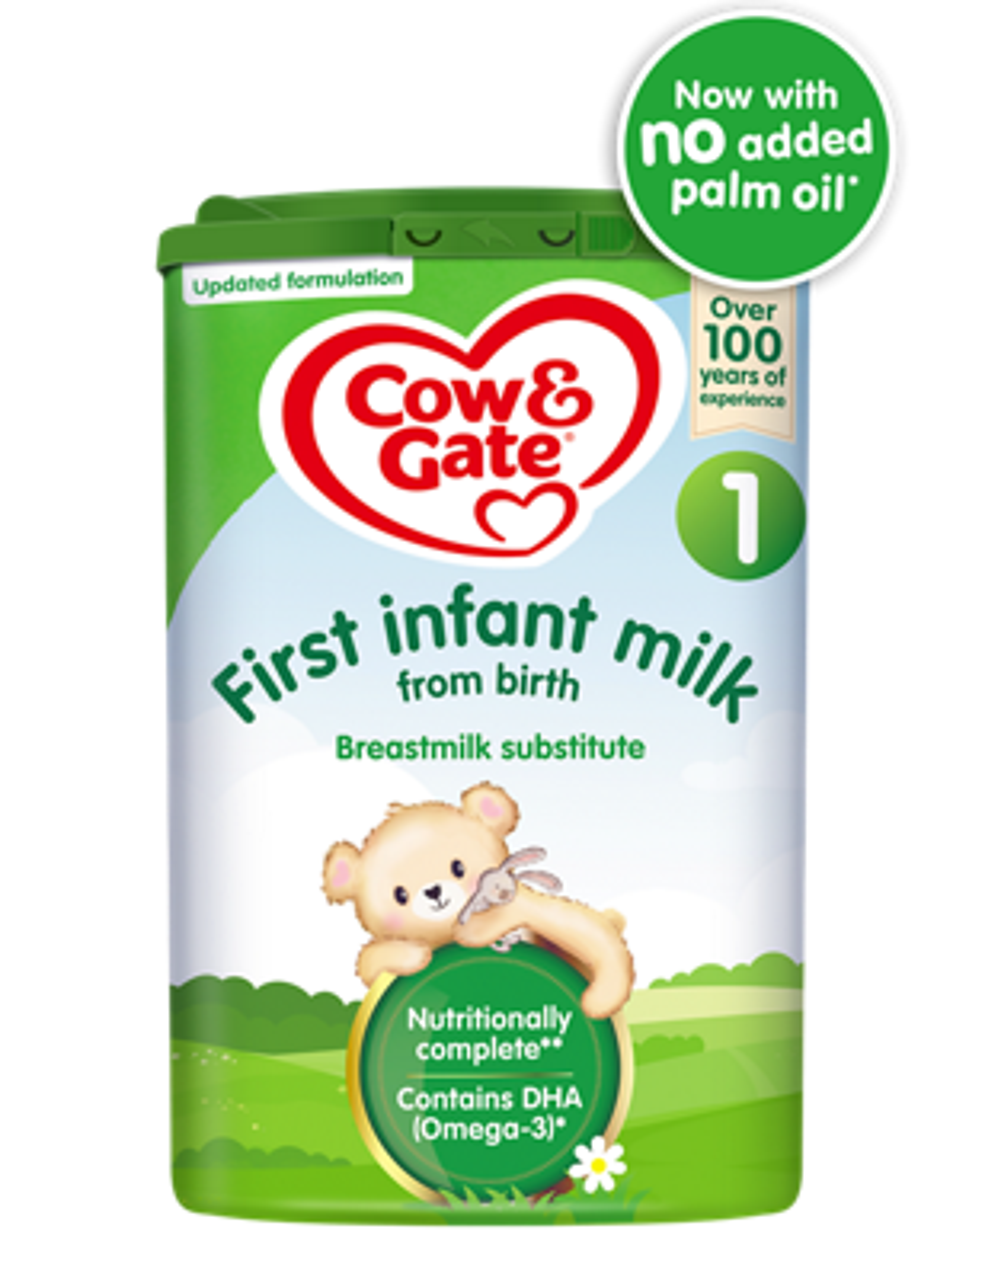 First infant milk